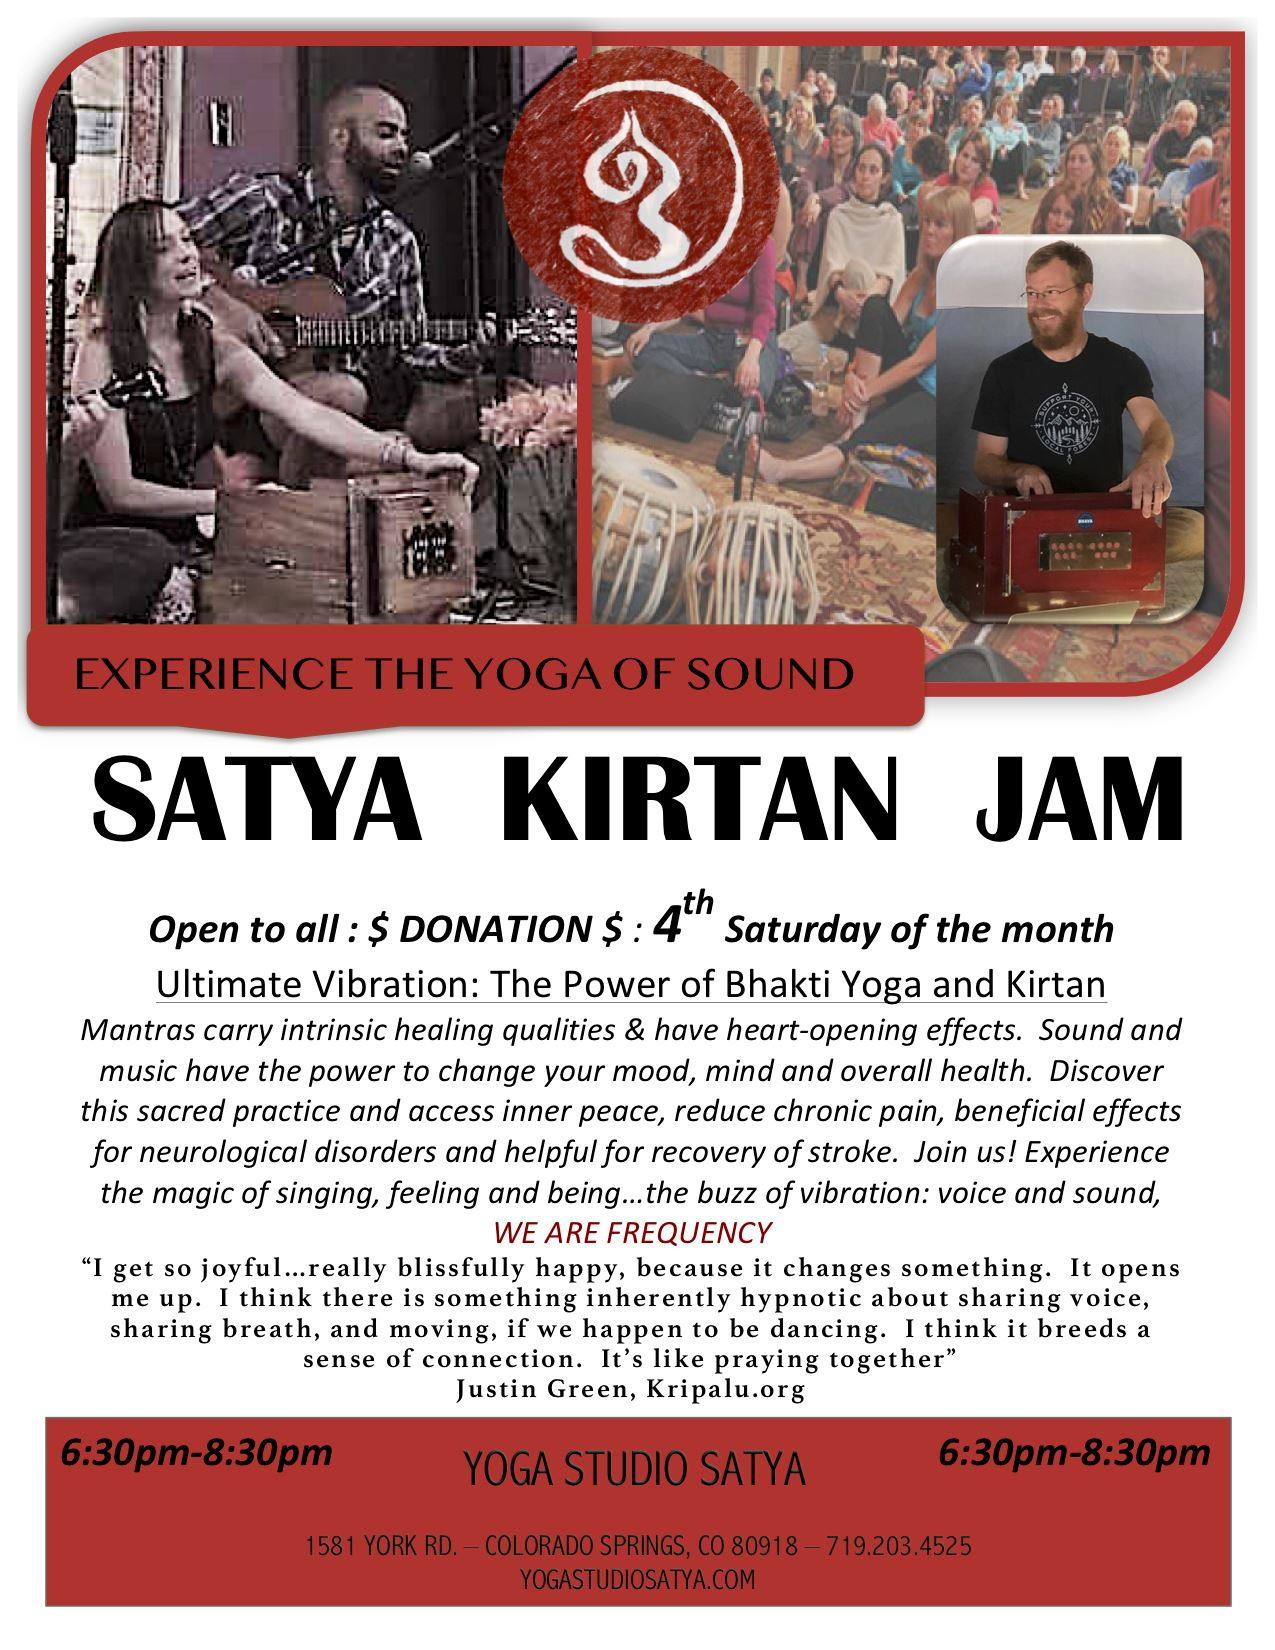 Kirtan Jam